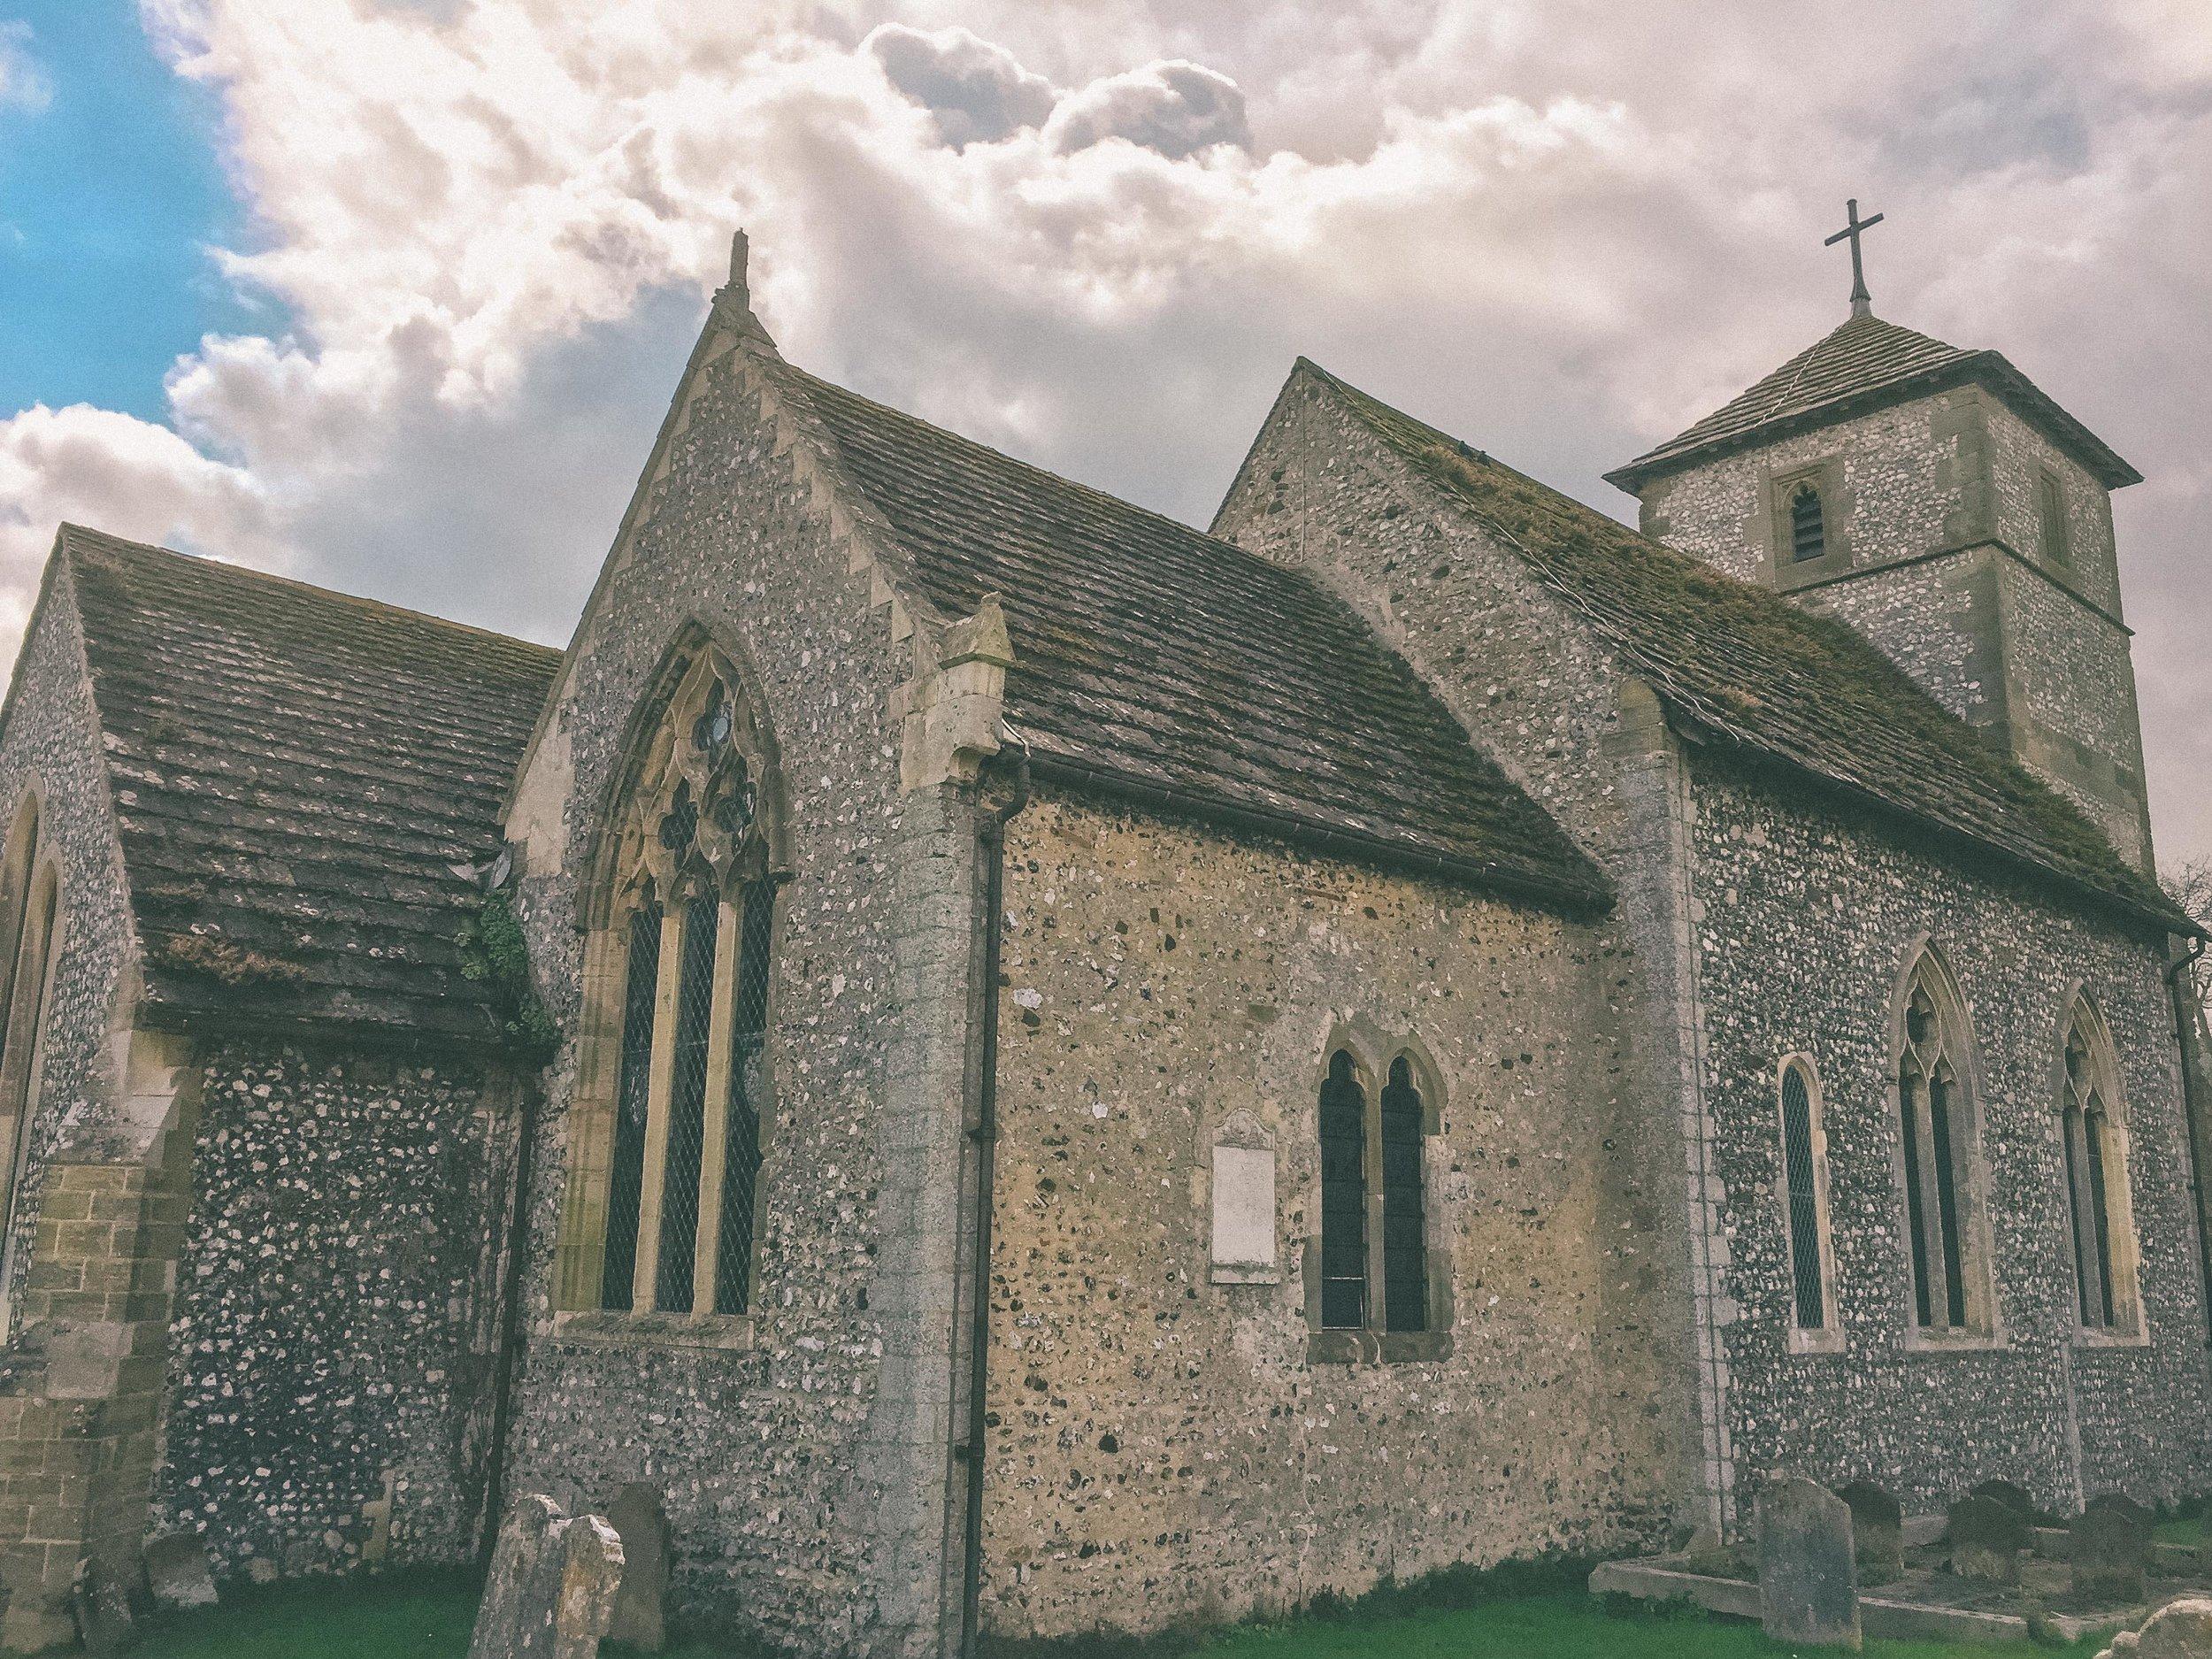 Wiston Chapel, Steyning, West Sussex, UK